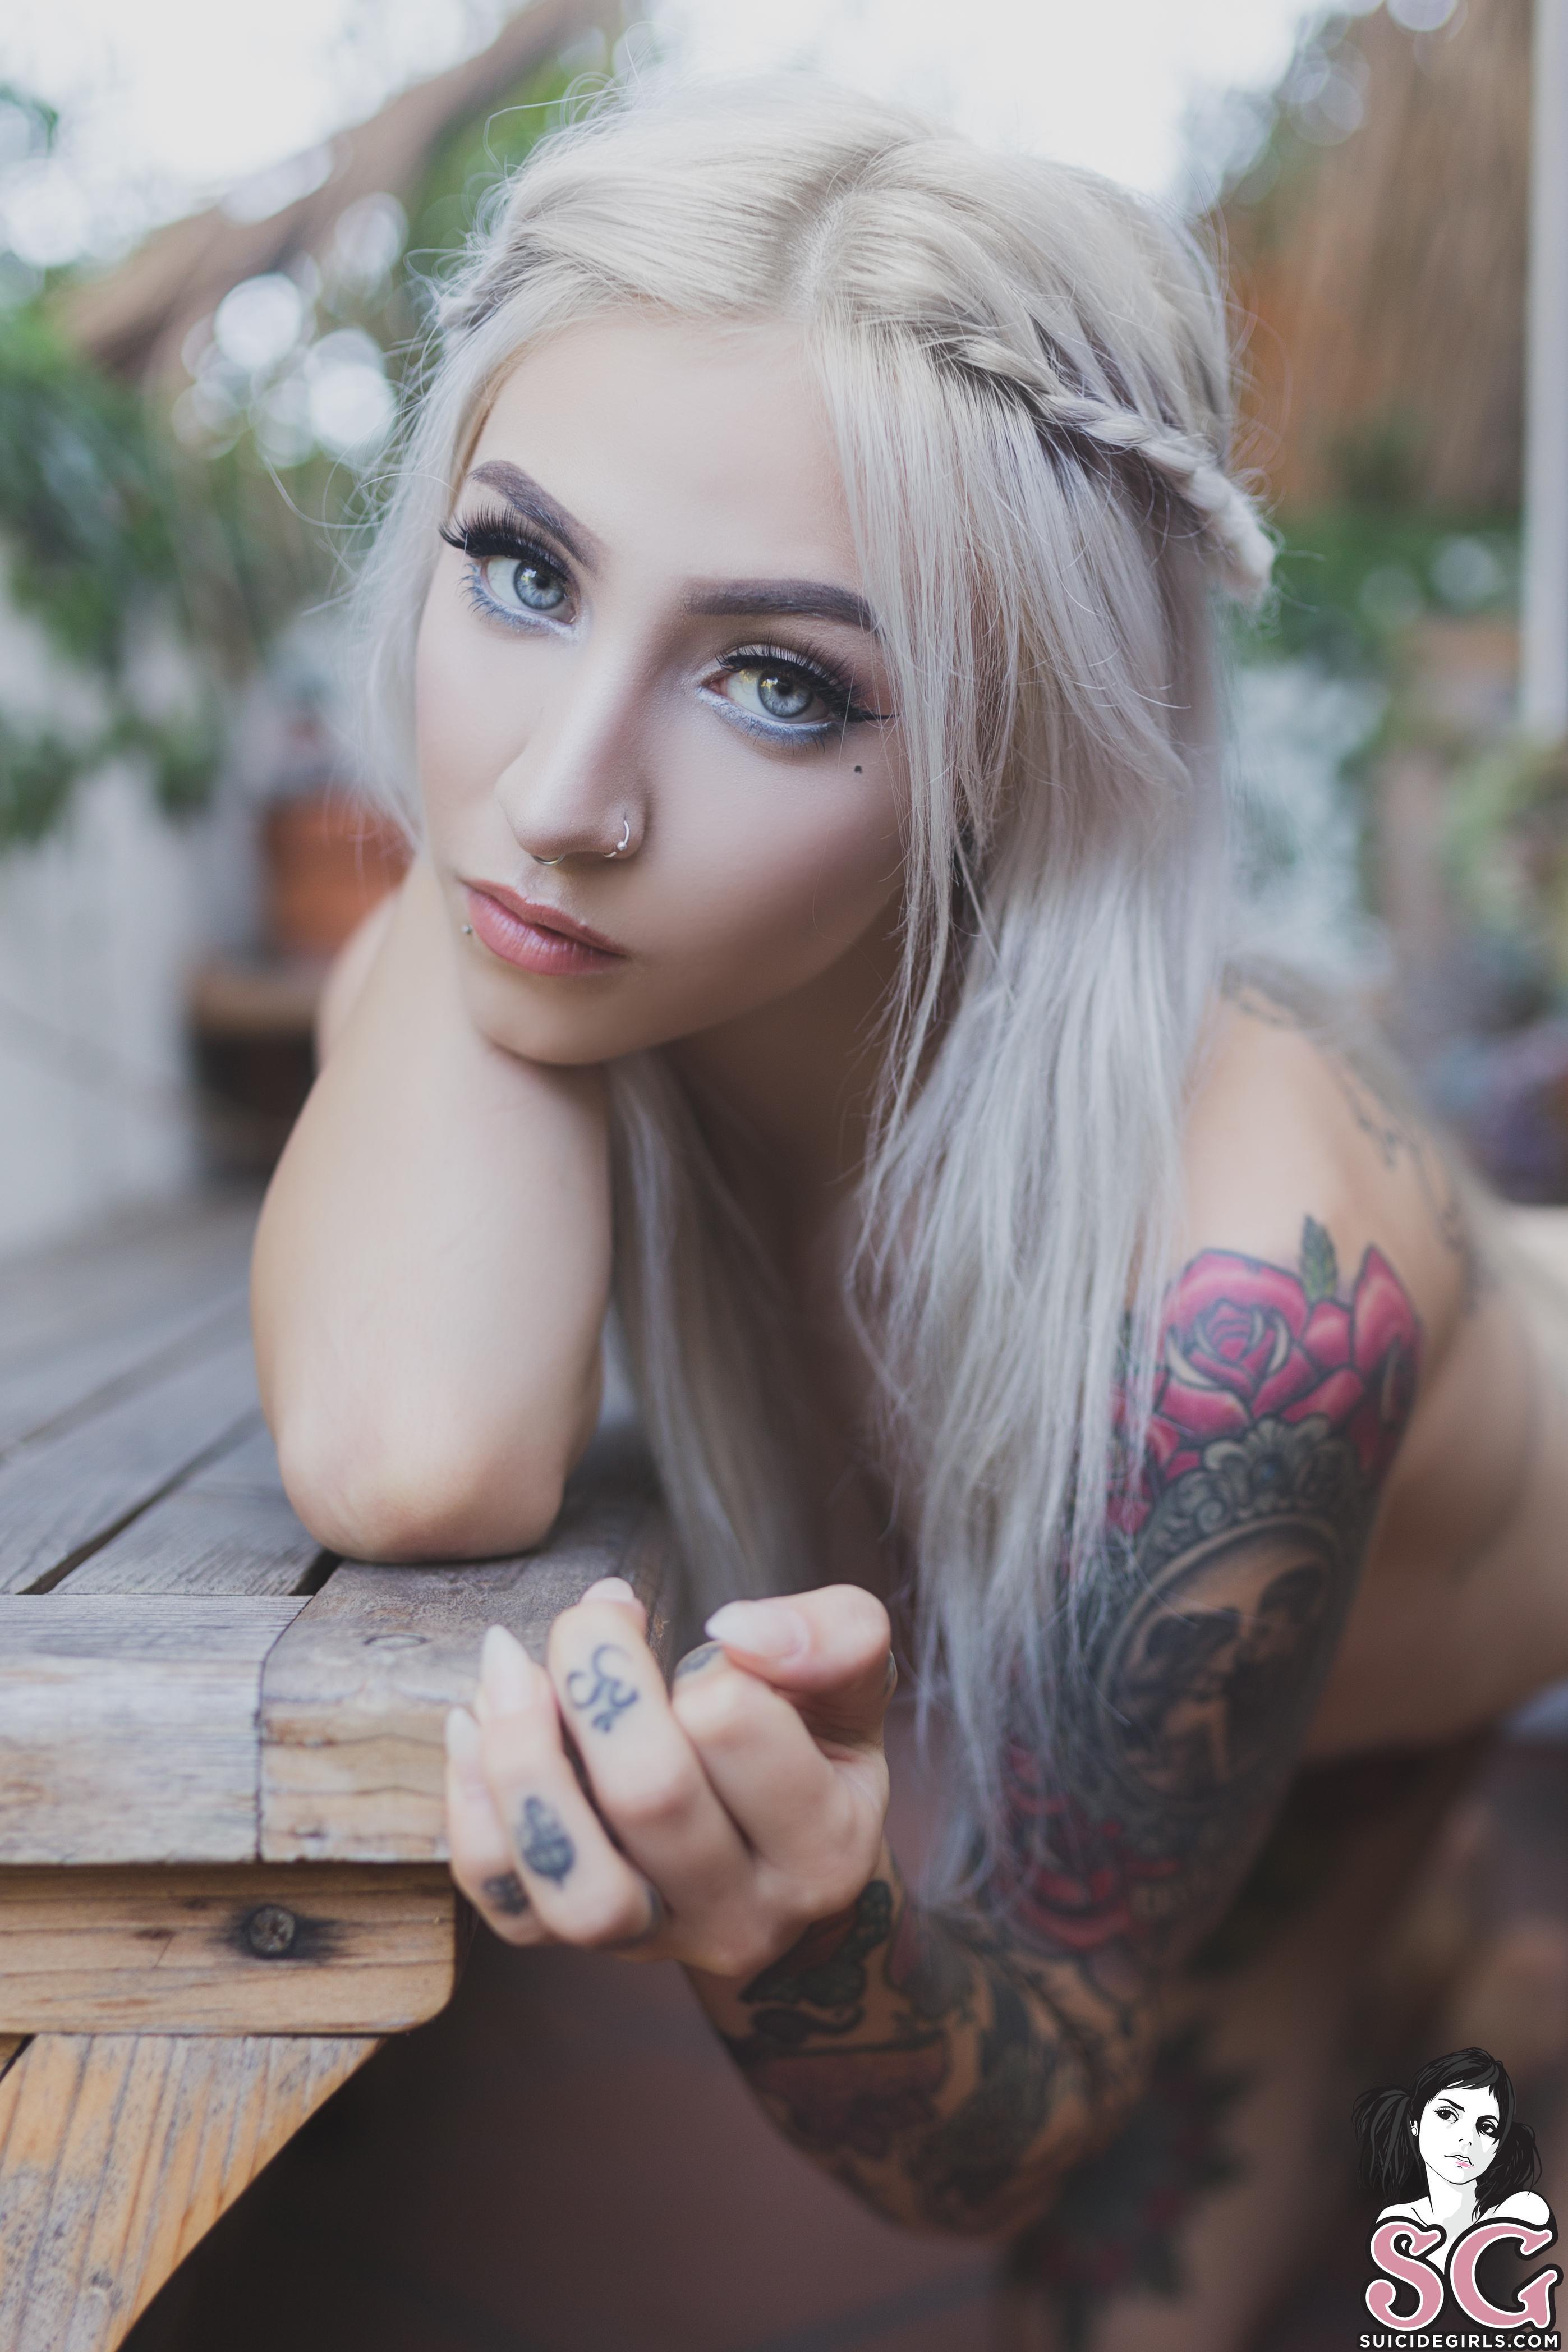 Suicidegirls Your dear, Juliet  Siterip  Imageset 5200px  Multimirror